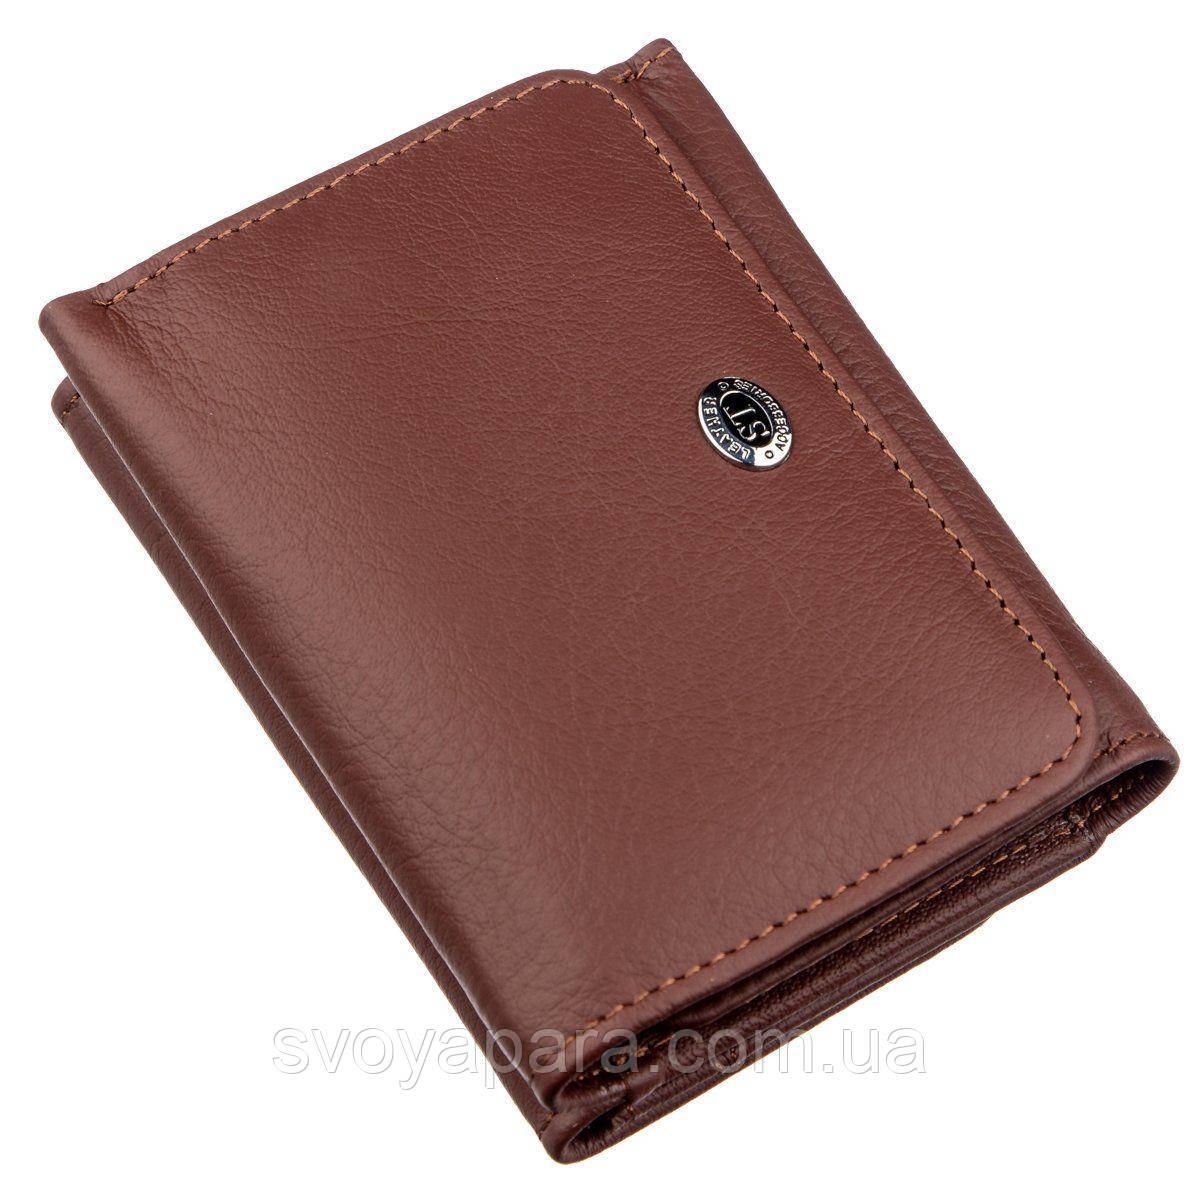 Женский кошелек с монетницей на кнопке ST Leather 18887 Коричневый